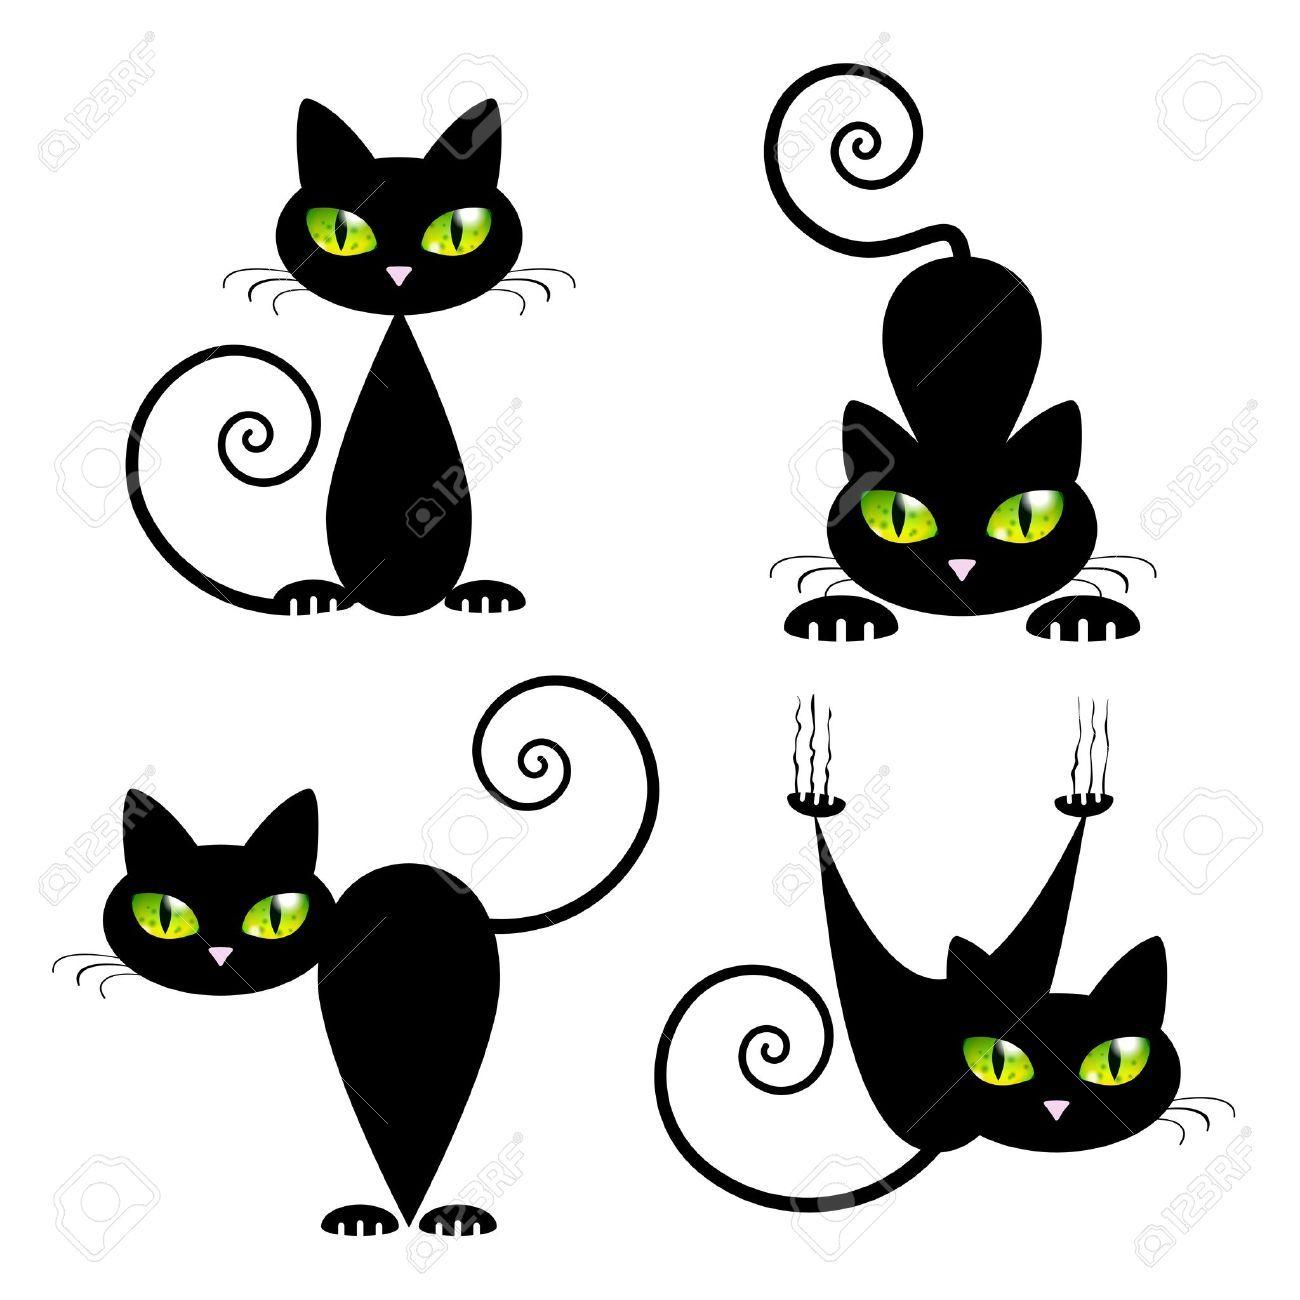 Black Cat Drawing Outline